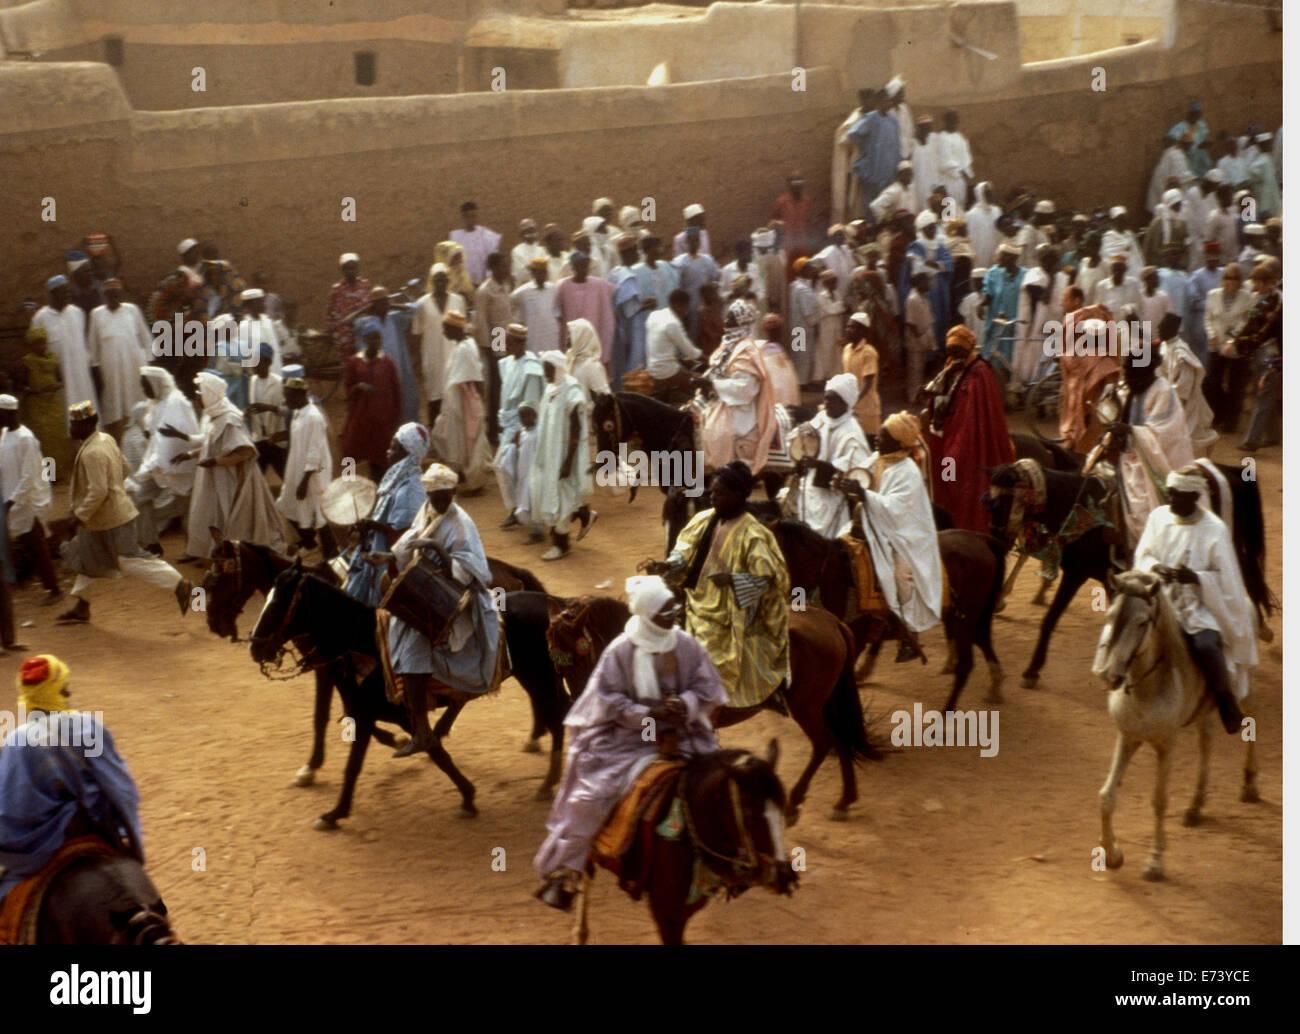 Parade of nobles on horseback marking Eid festivities in Kano, 1970s - Stock Image